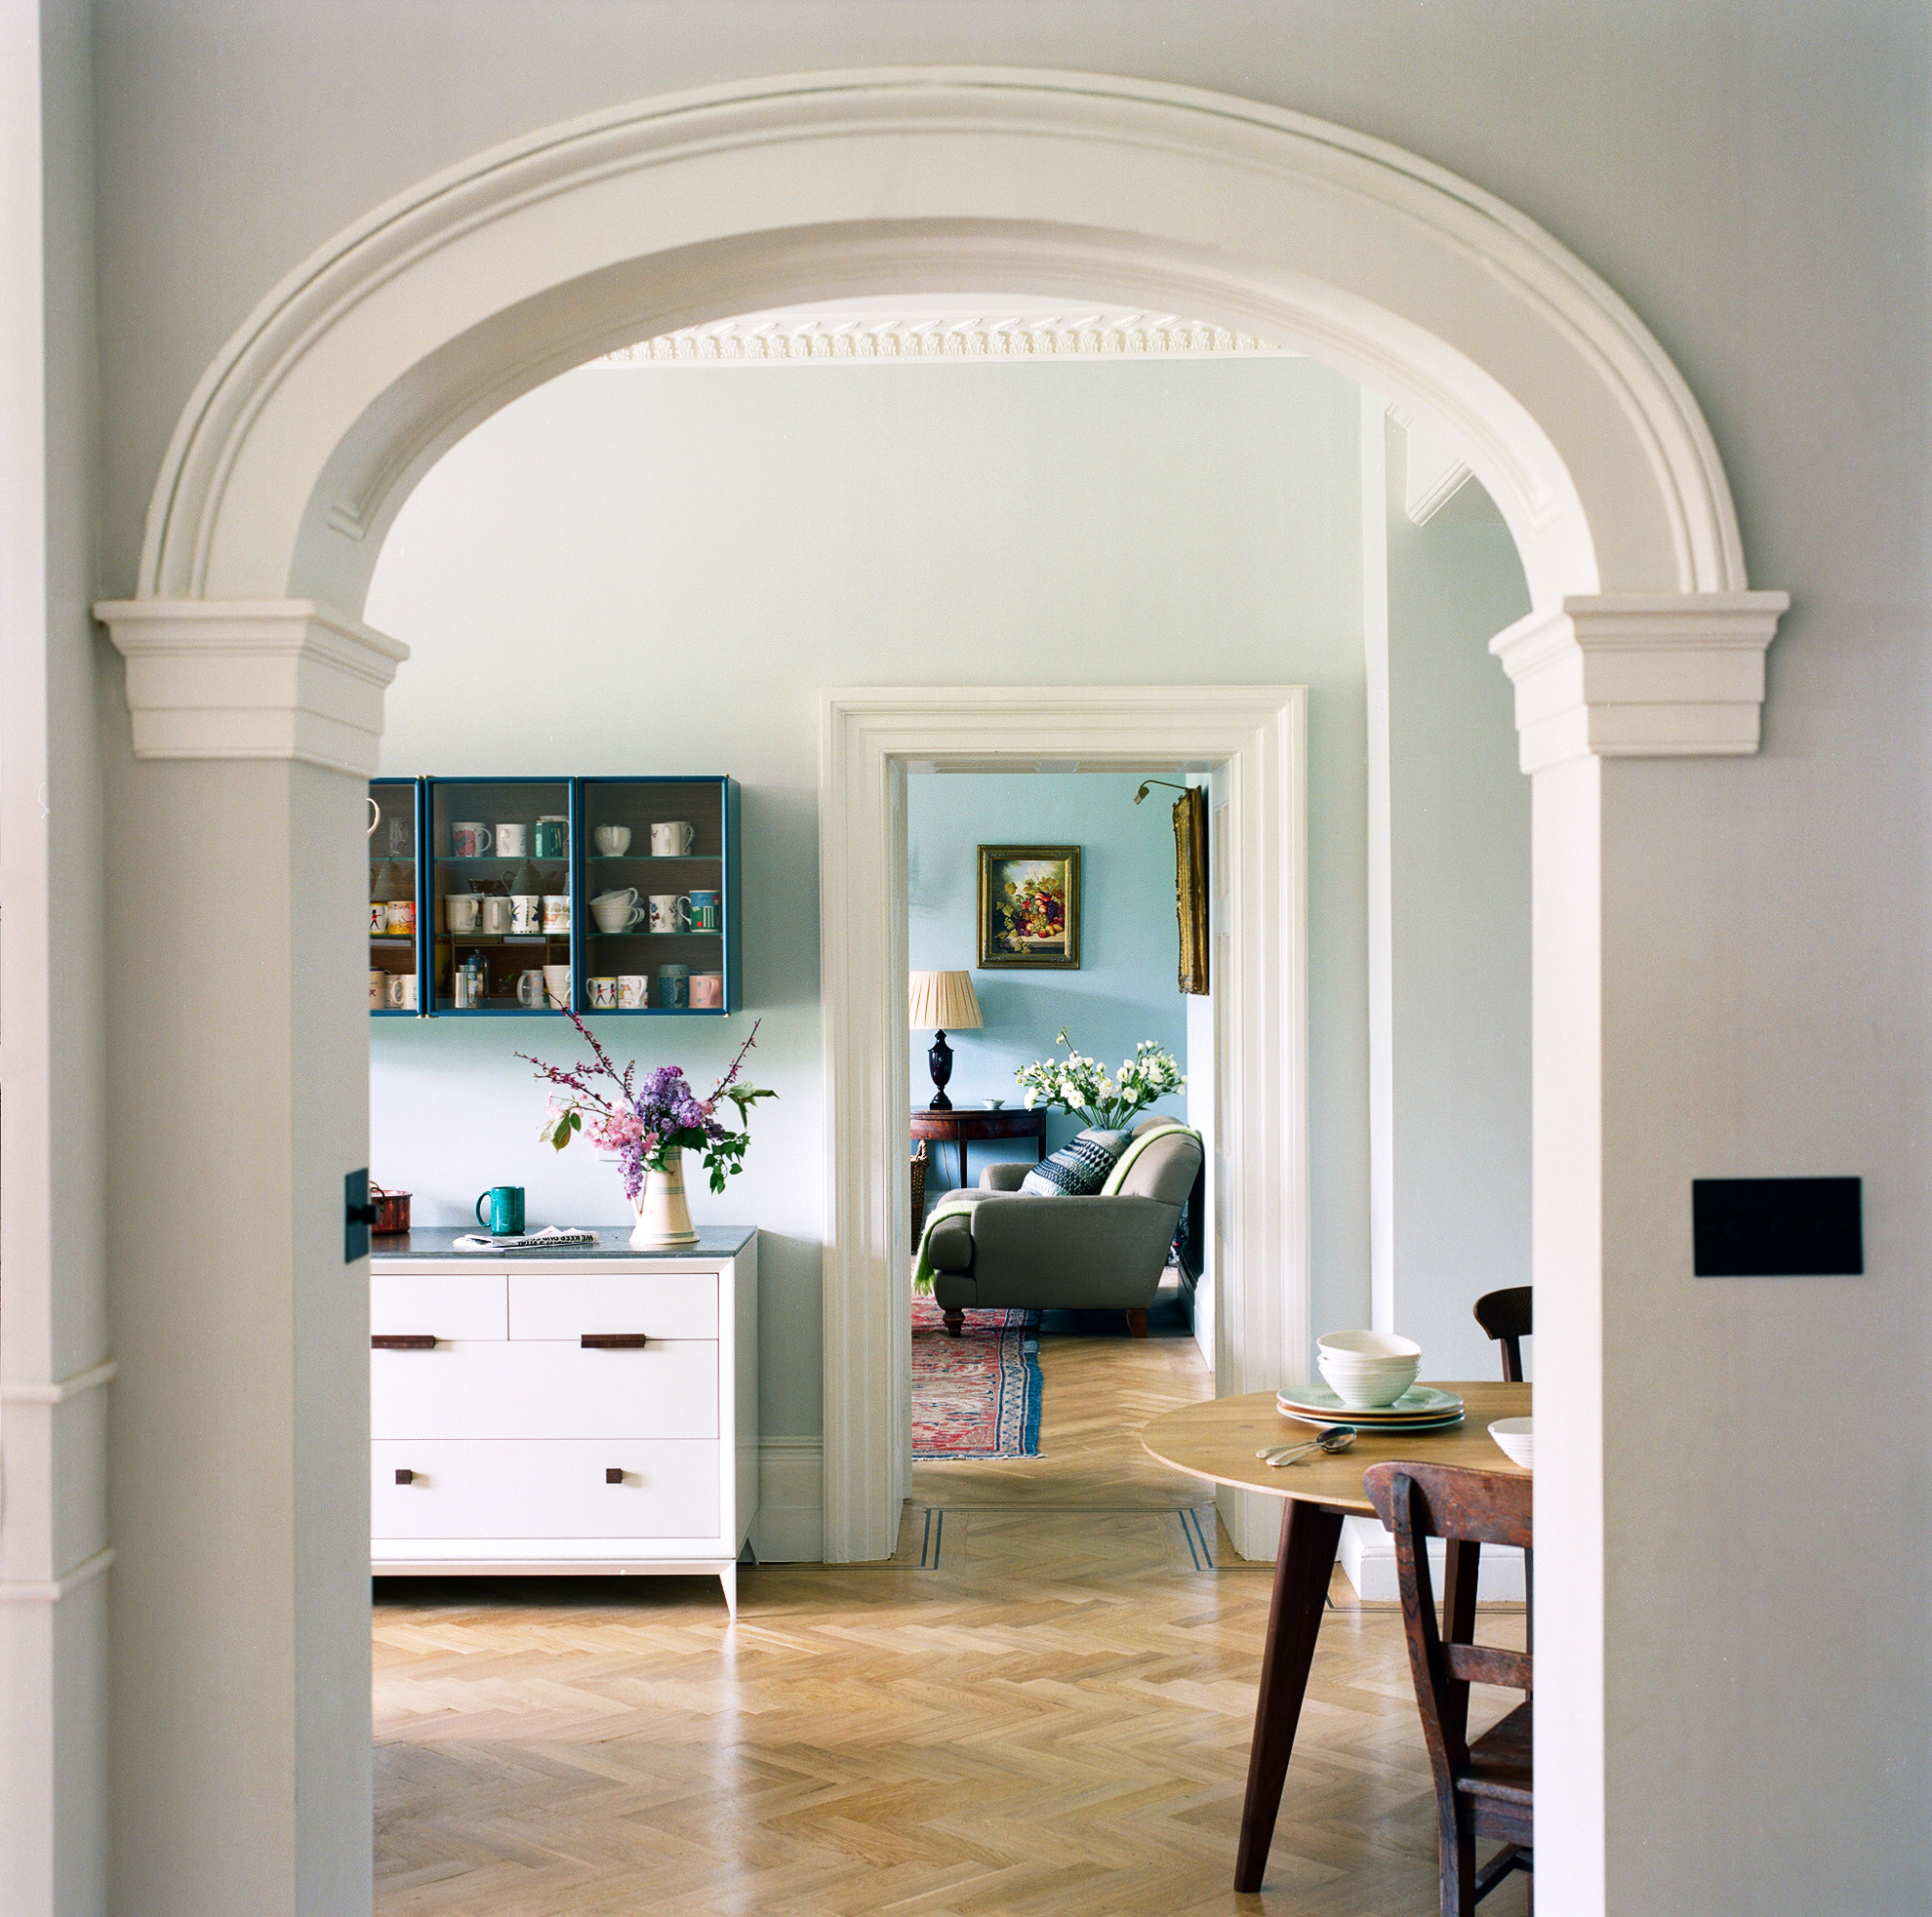 Robinson Van Noort - Interior Designer London